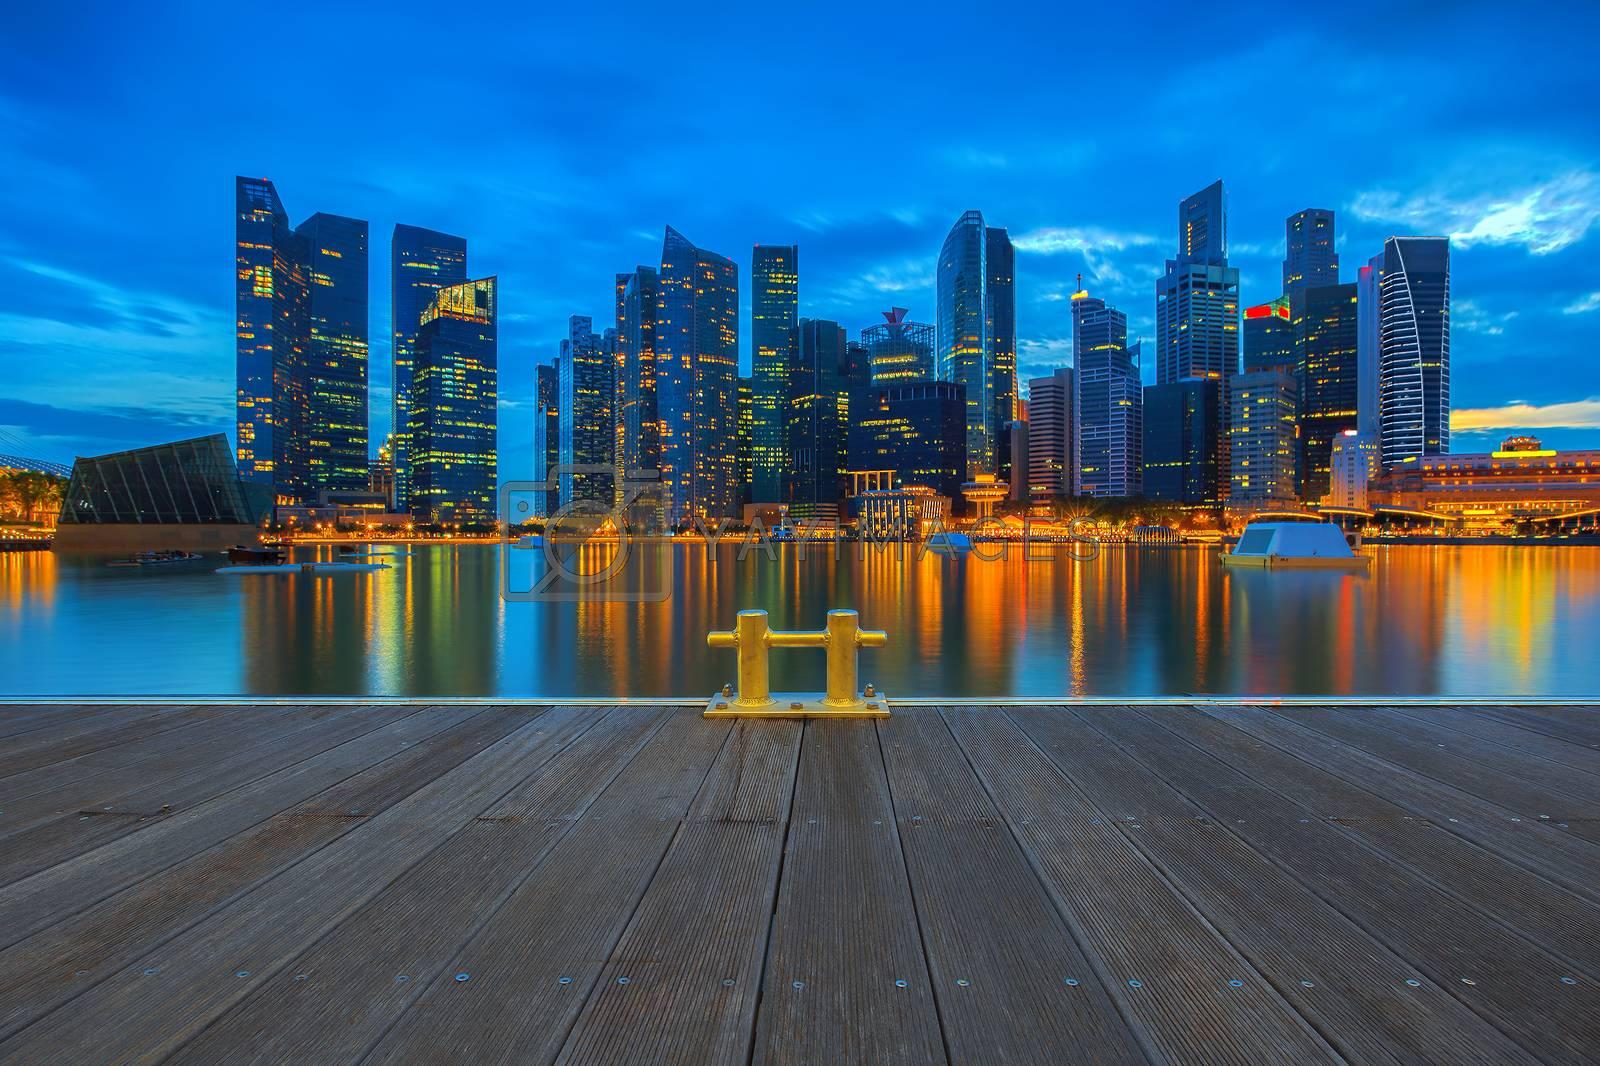 Singapore Skyline by kjorgen